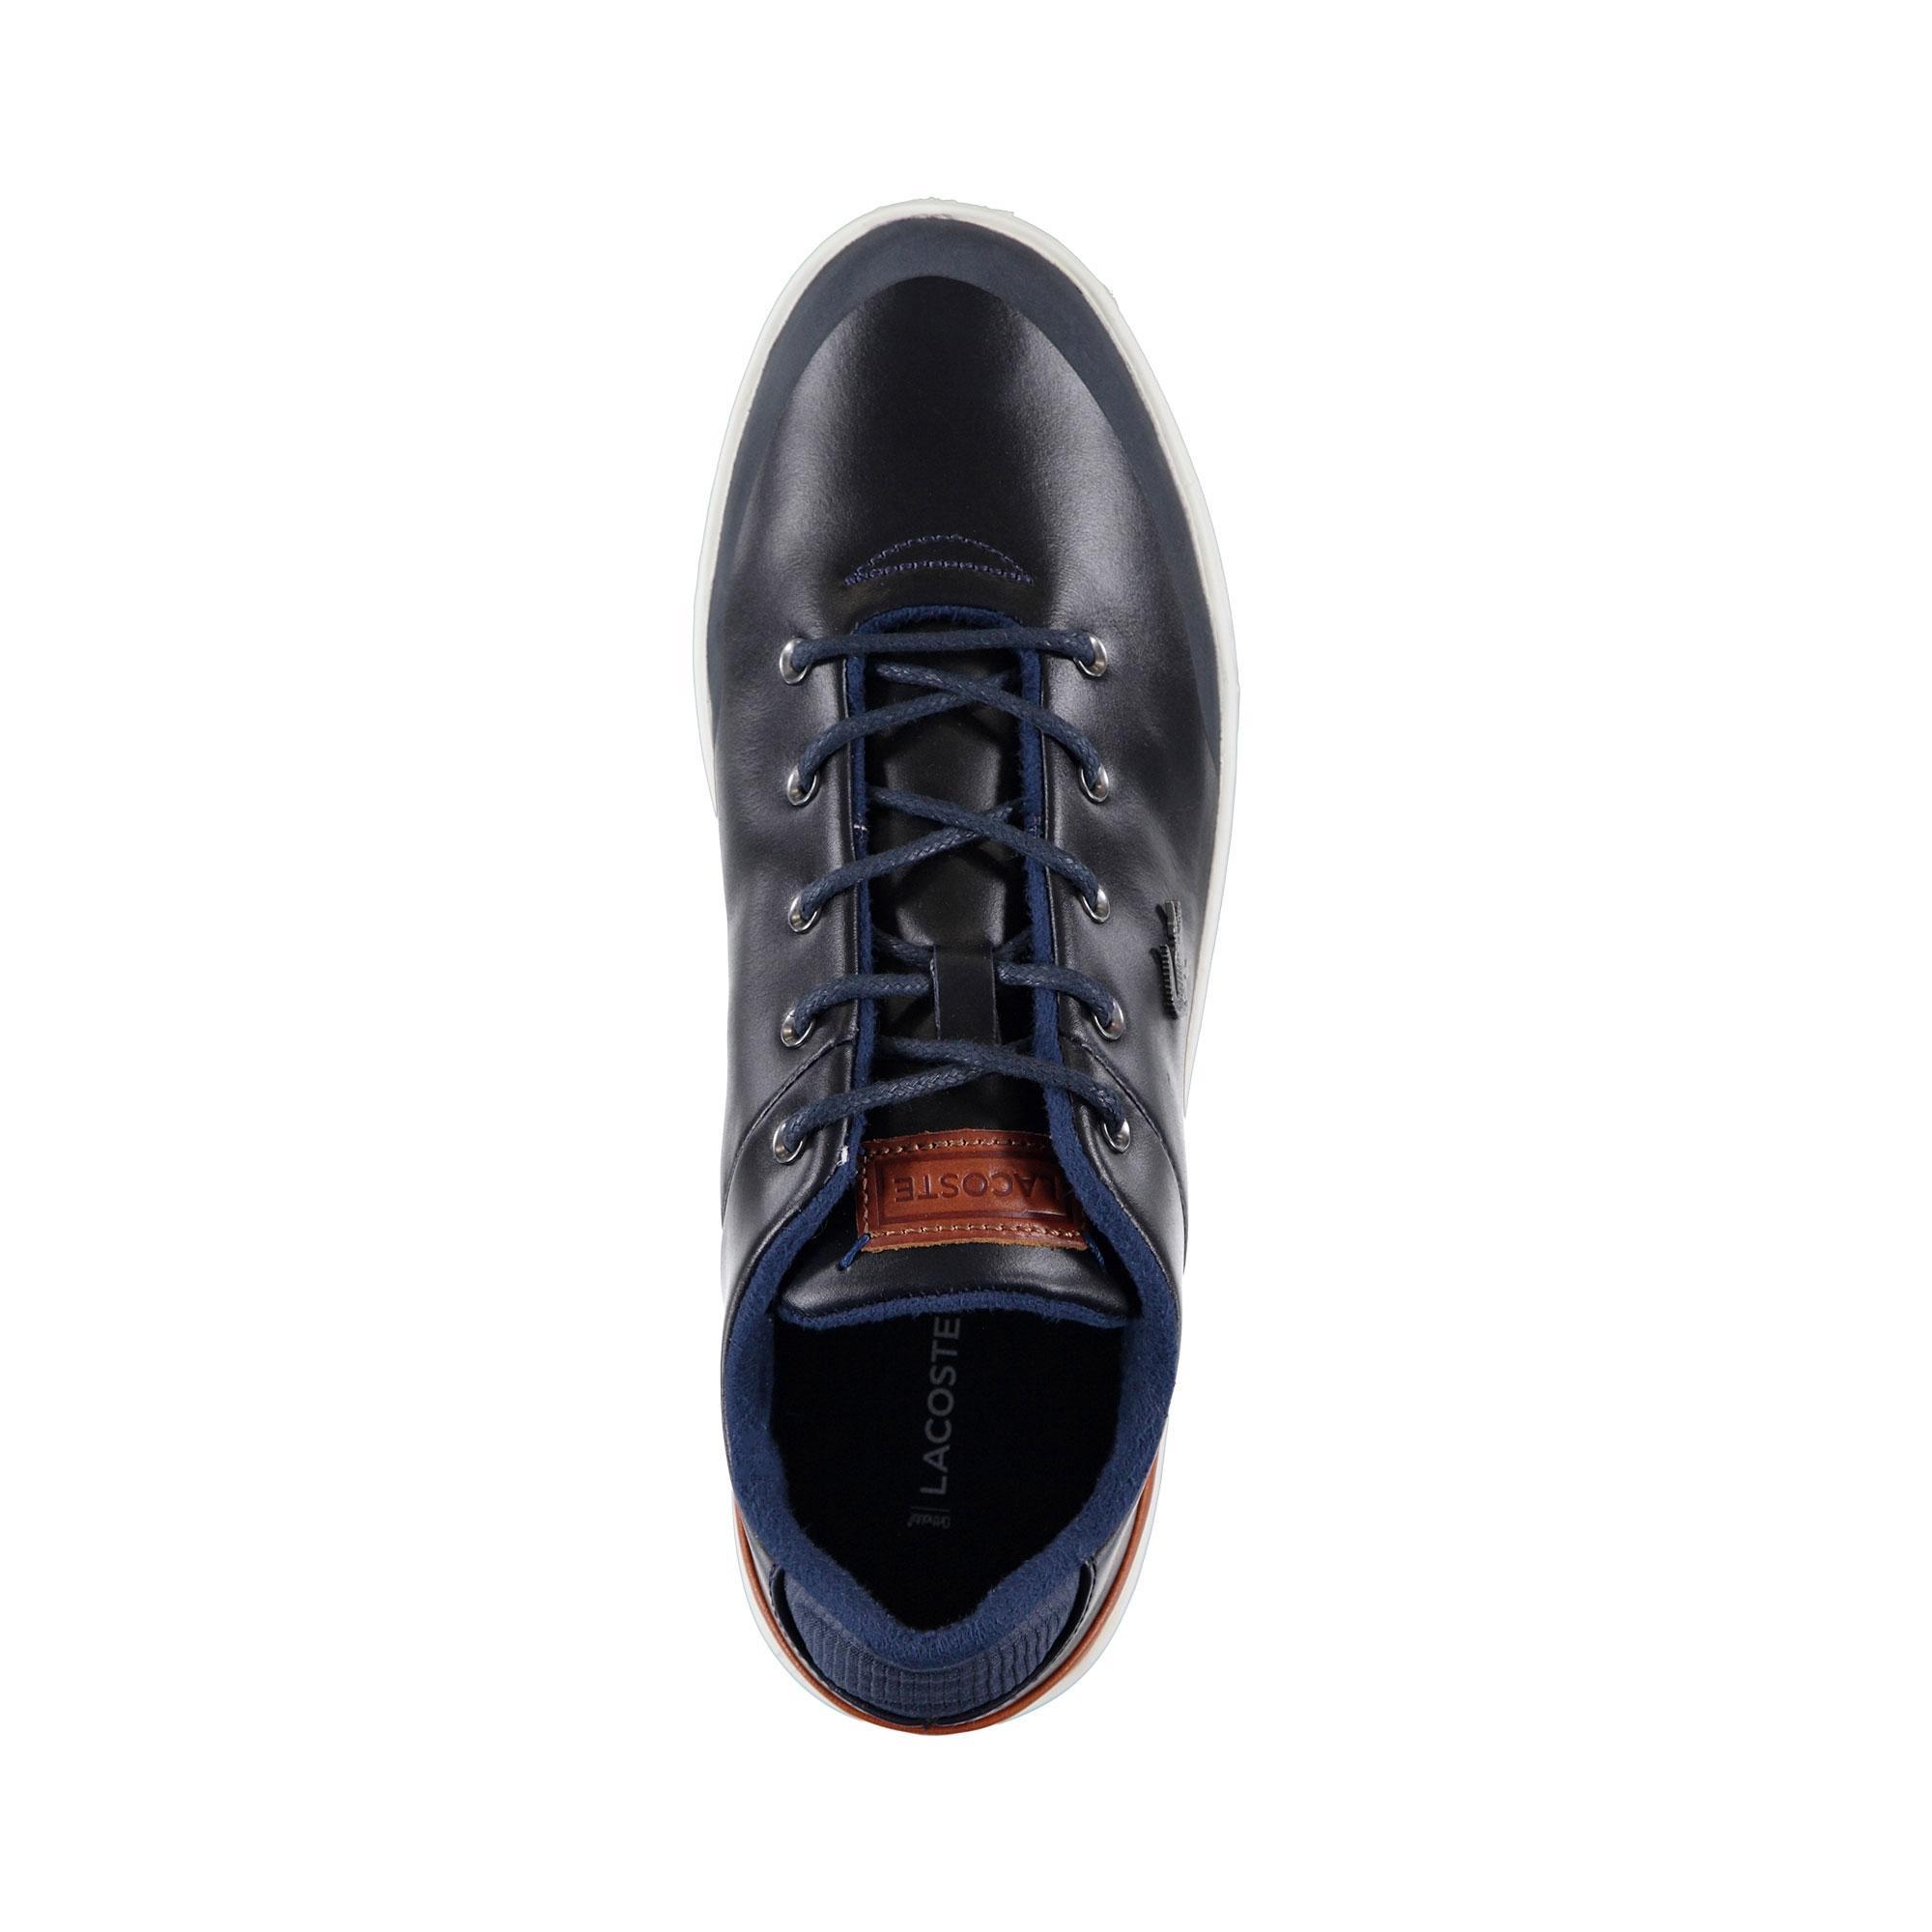 Lacoste Erkek Explorateur Classiclo 3181 Lacivert Sneaker